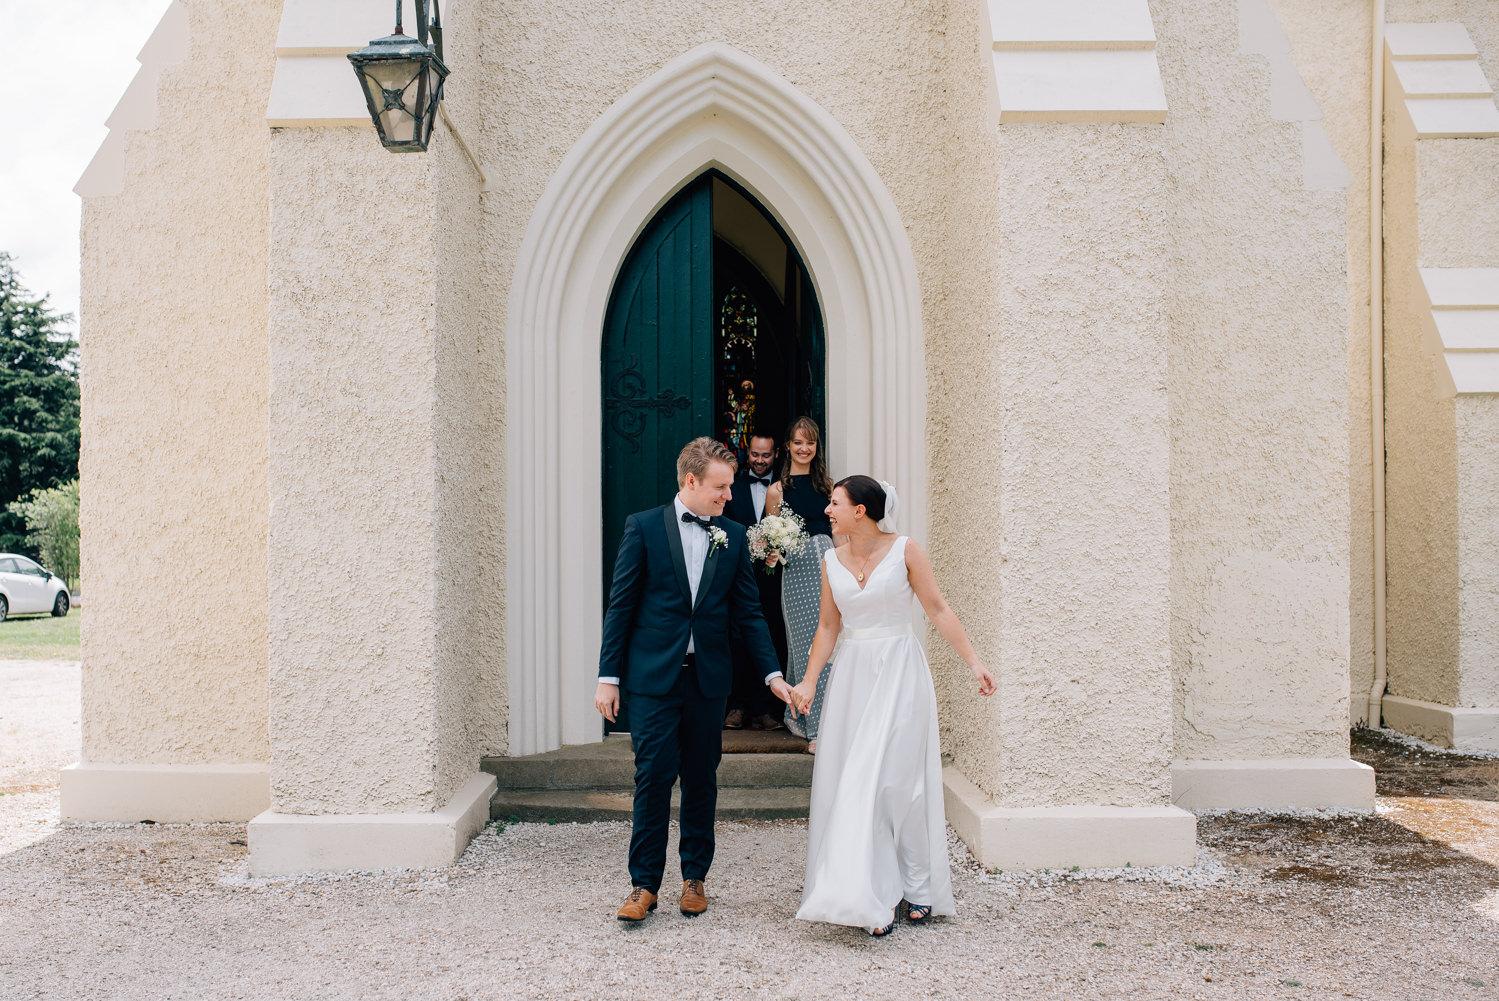 Josef-Chromy-Wedding-Photographer-38.jpg